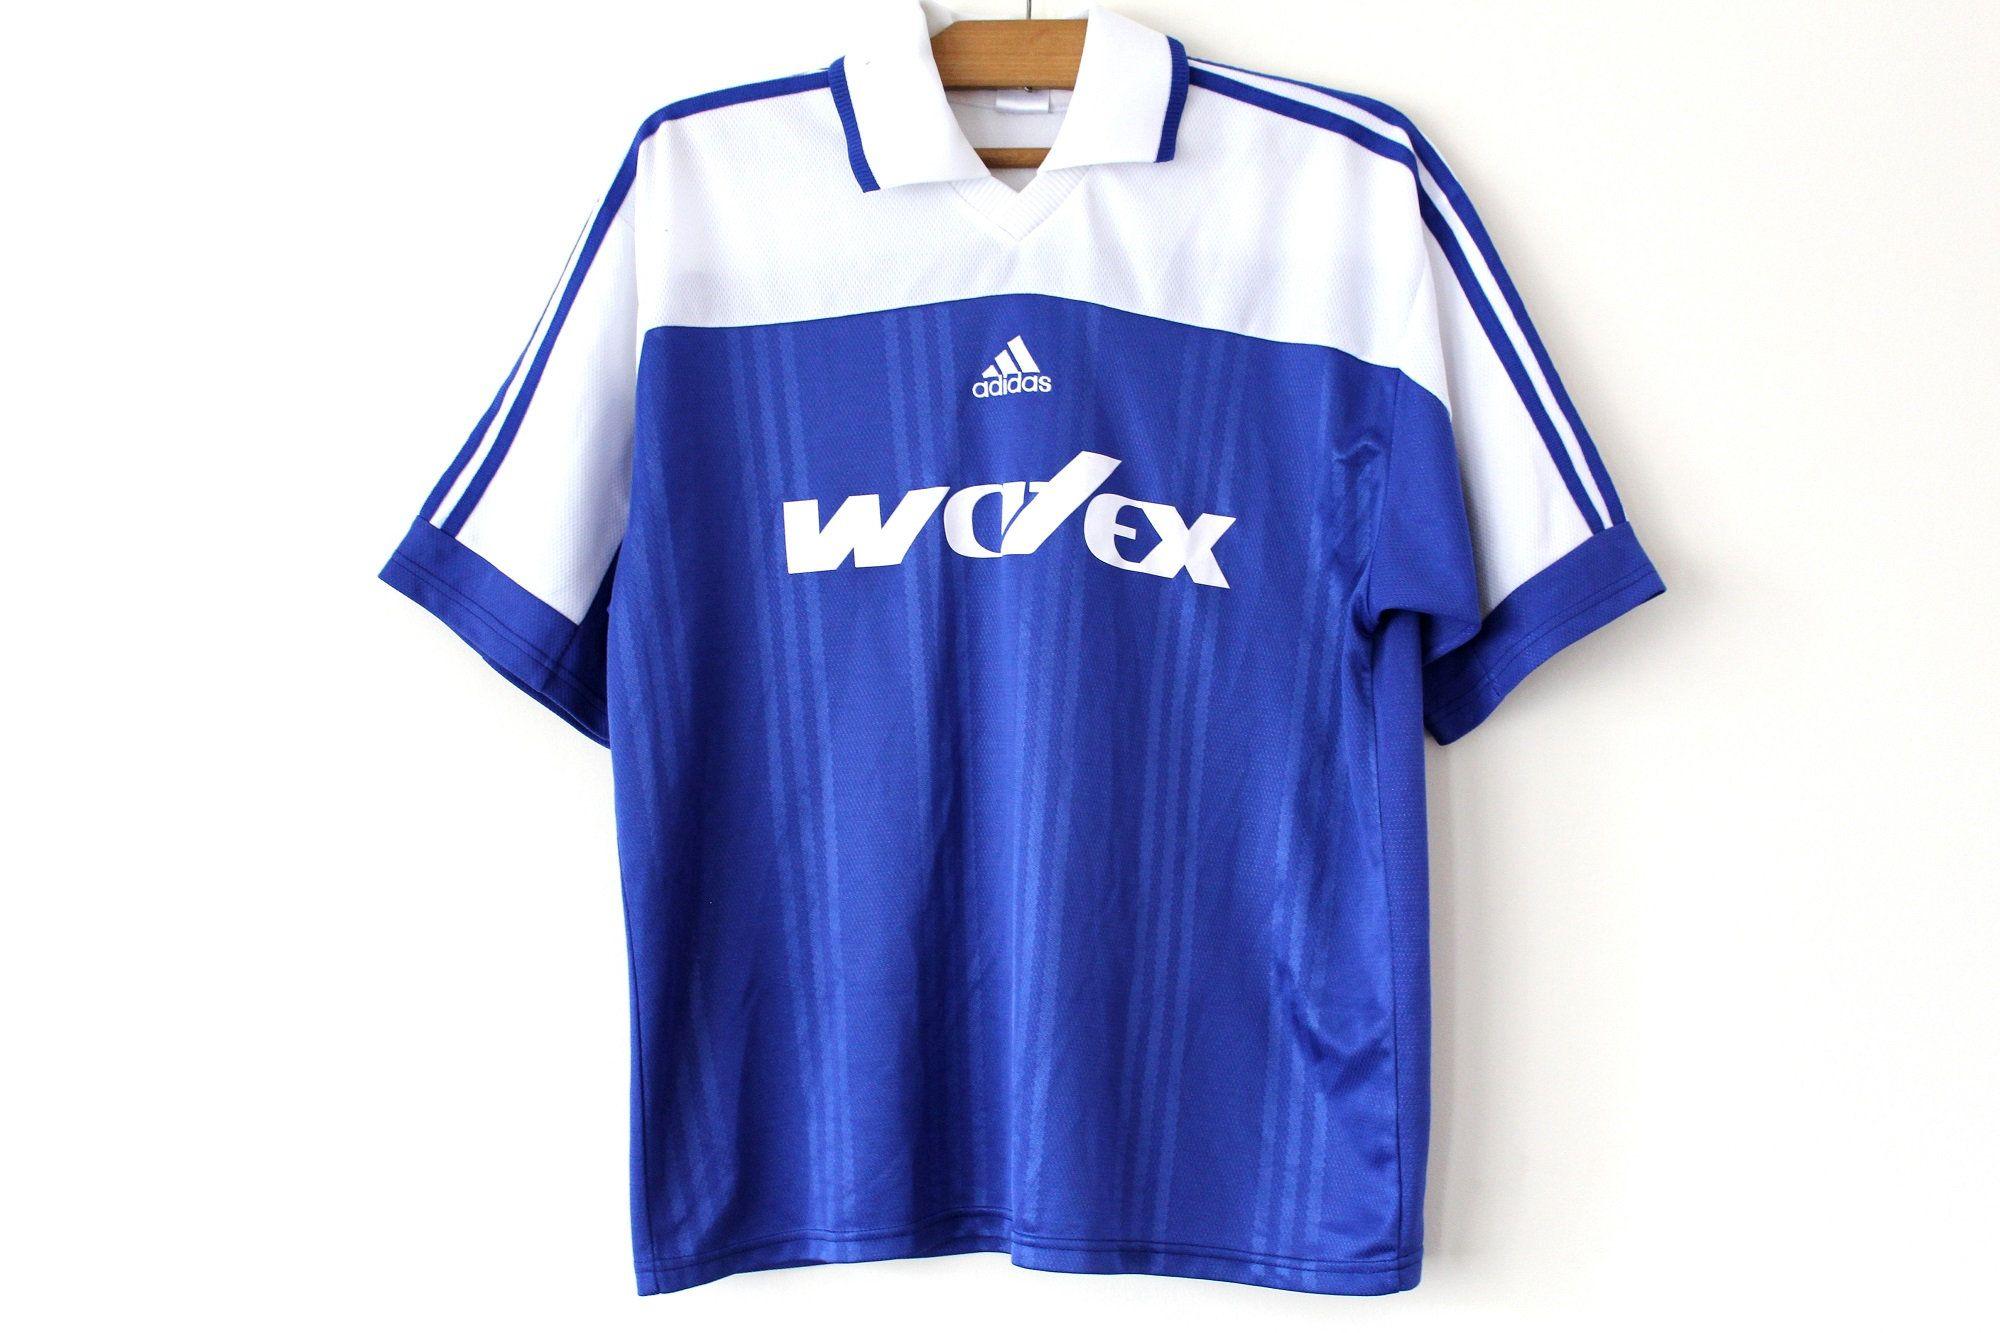 Retro Adidas Football Shirt Made In Portugal Shiny Adidas Soccer Shirt Blue White Adidas Jersey Adidas Sports Tshirt Designs Football Shirts Soccer Shirts